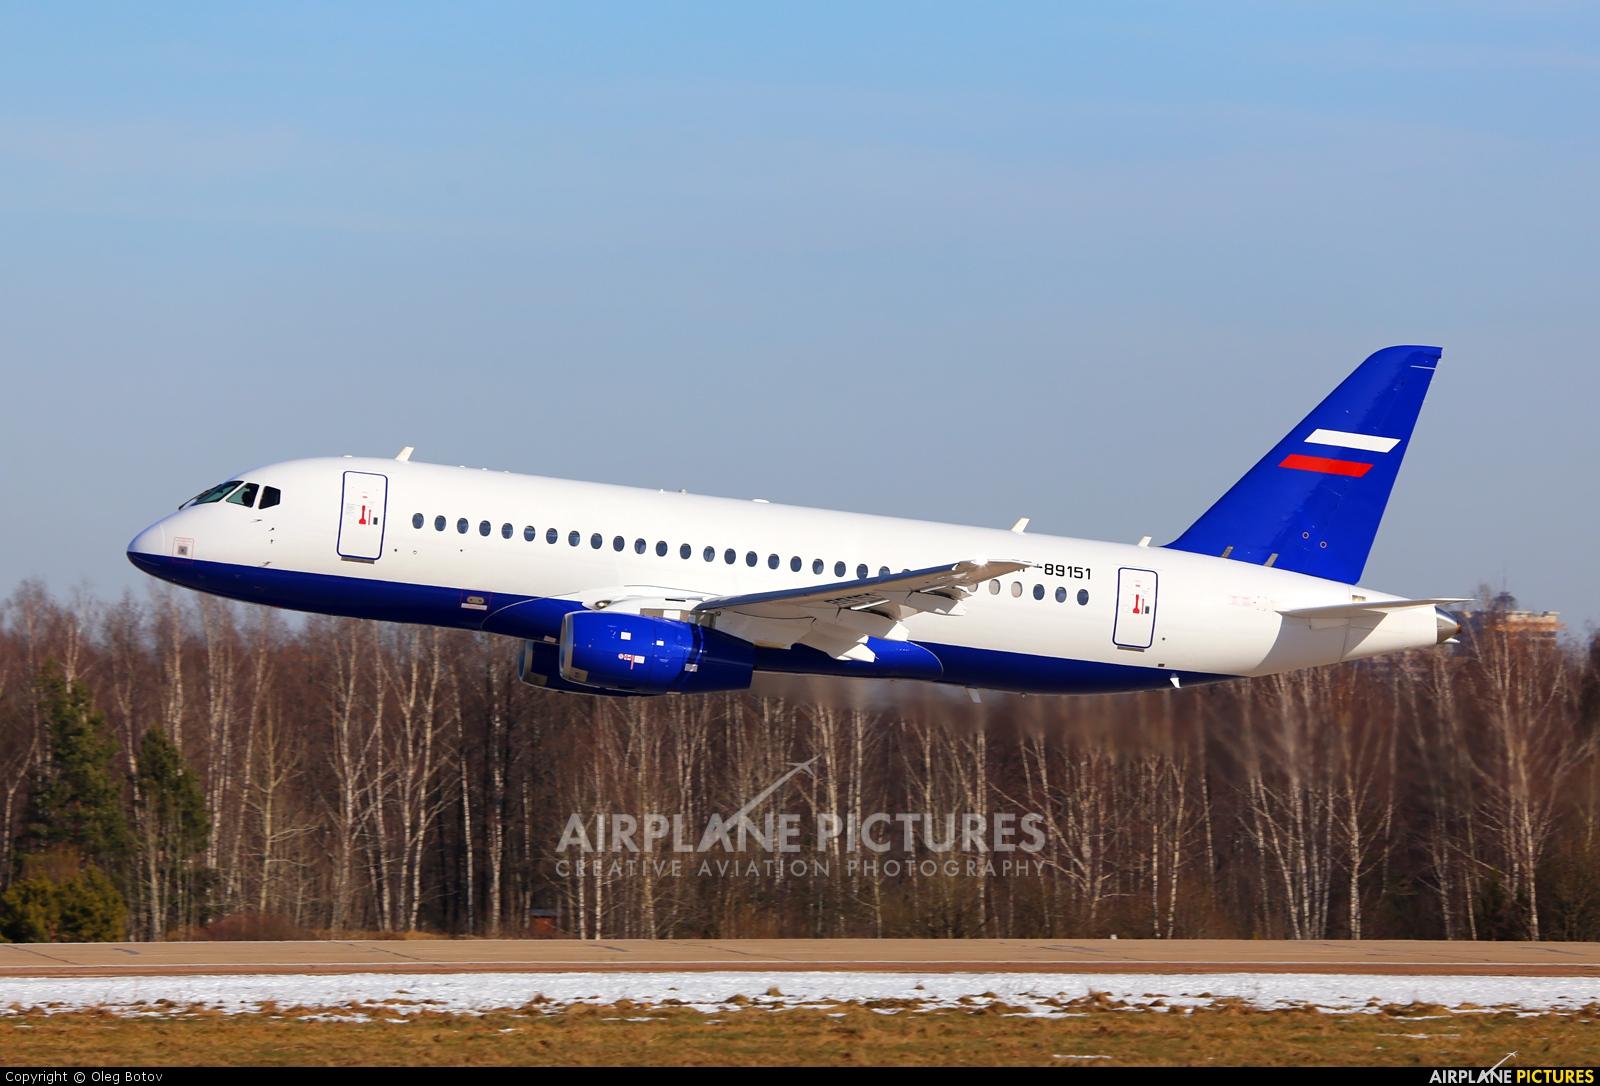 Russia - Ministry of Internal Affairs RF-89151 aircraft at Ramenskoye - Zhukovsky